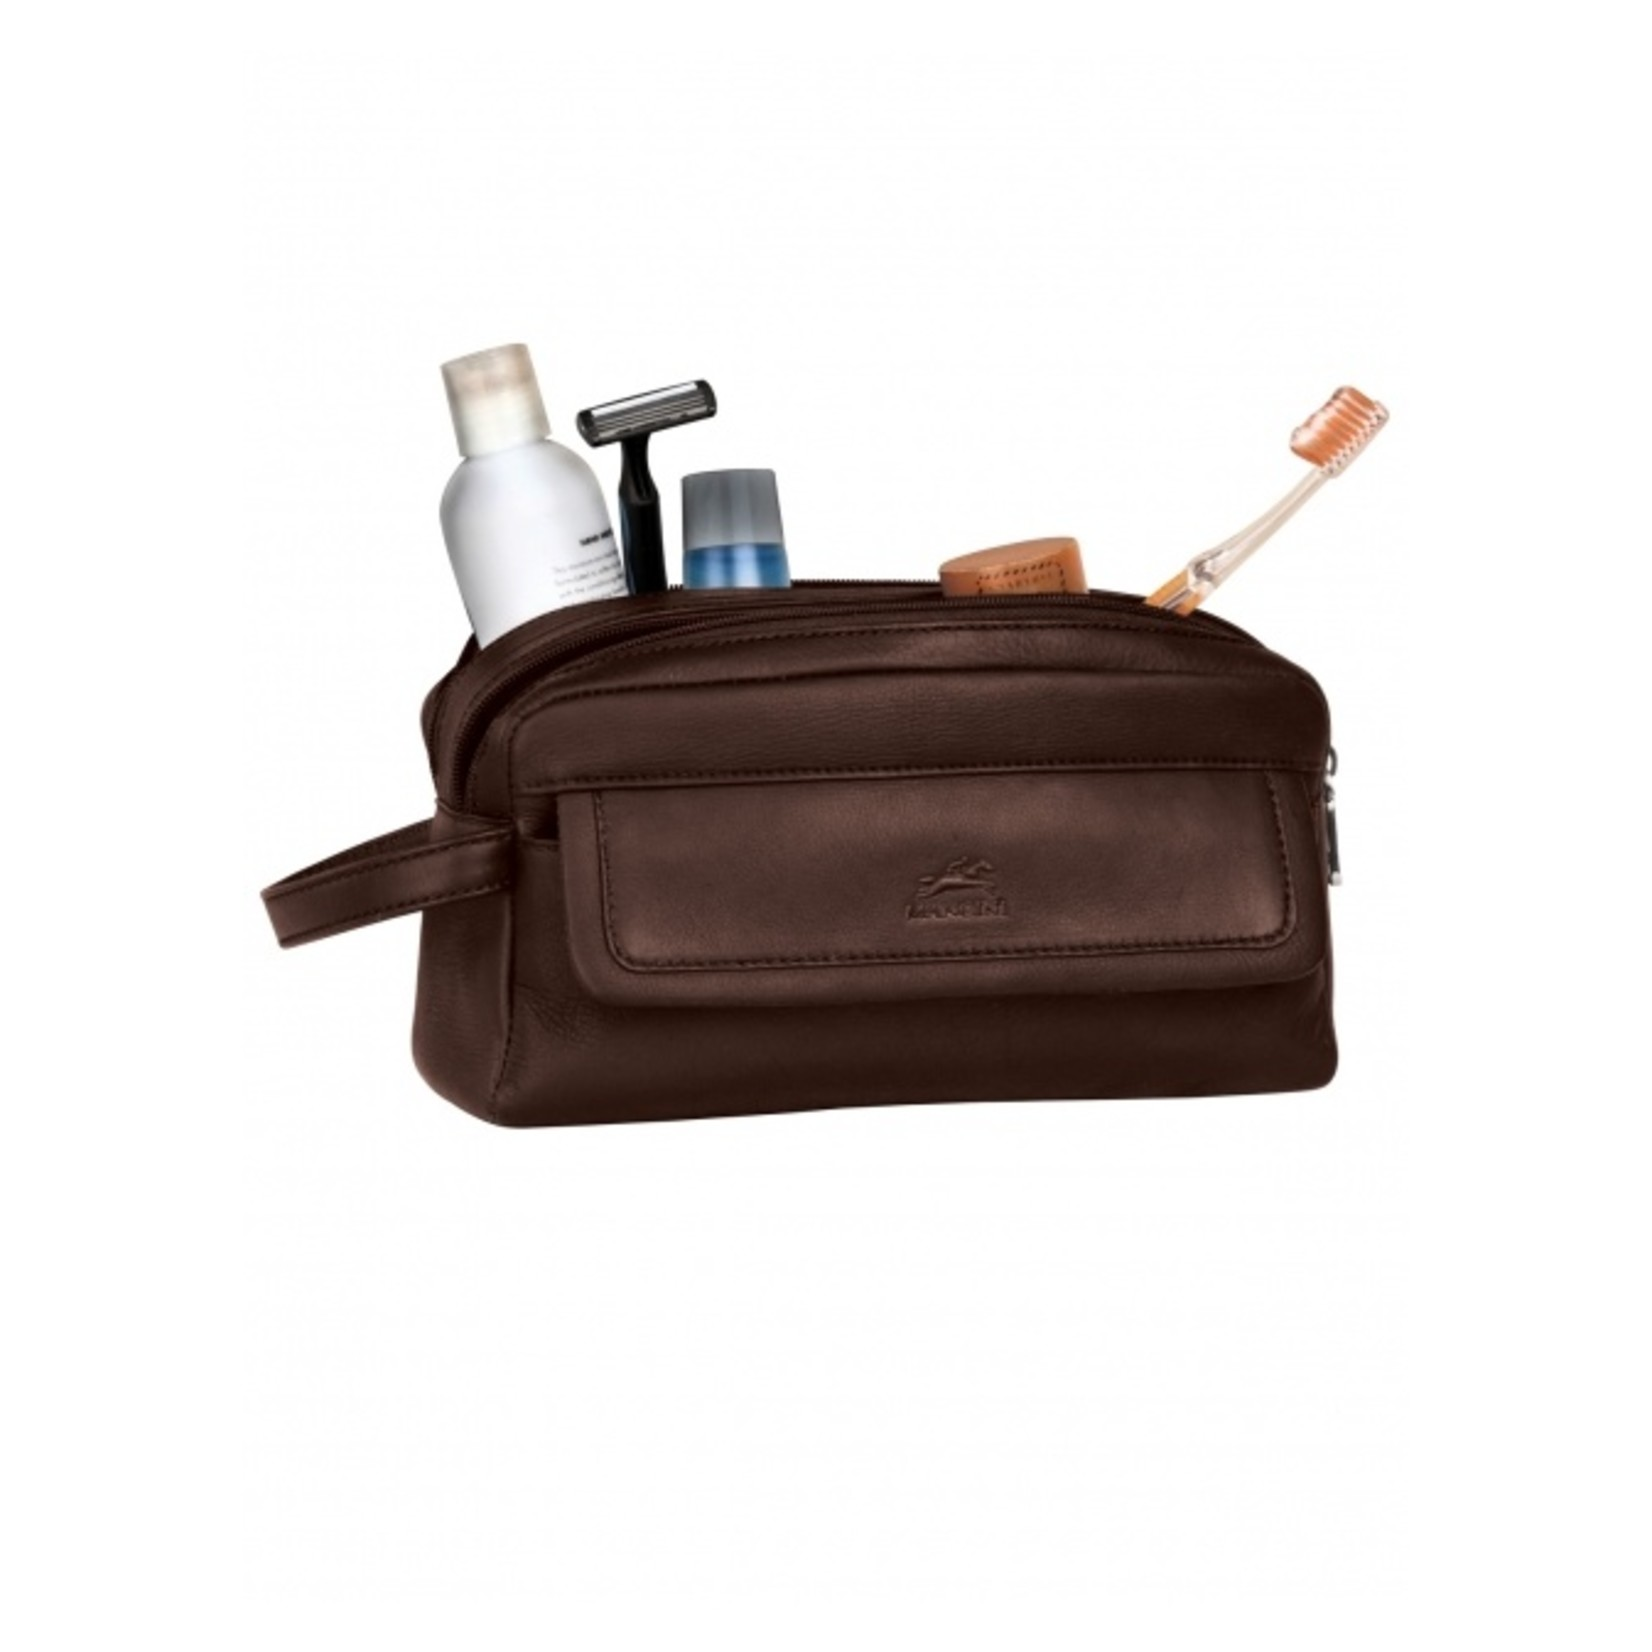 Mancini Mancini 98201 Double Compartment Toiletry Bag